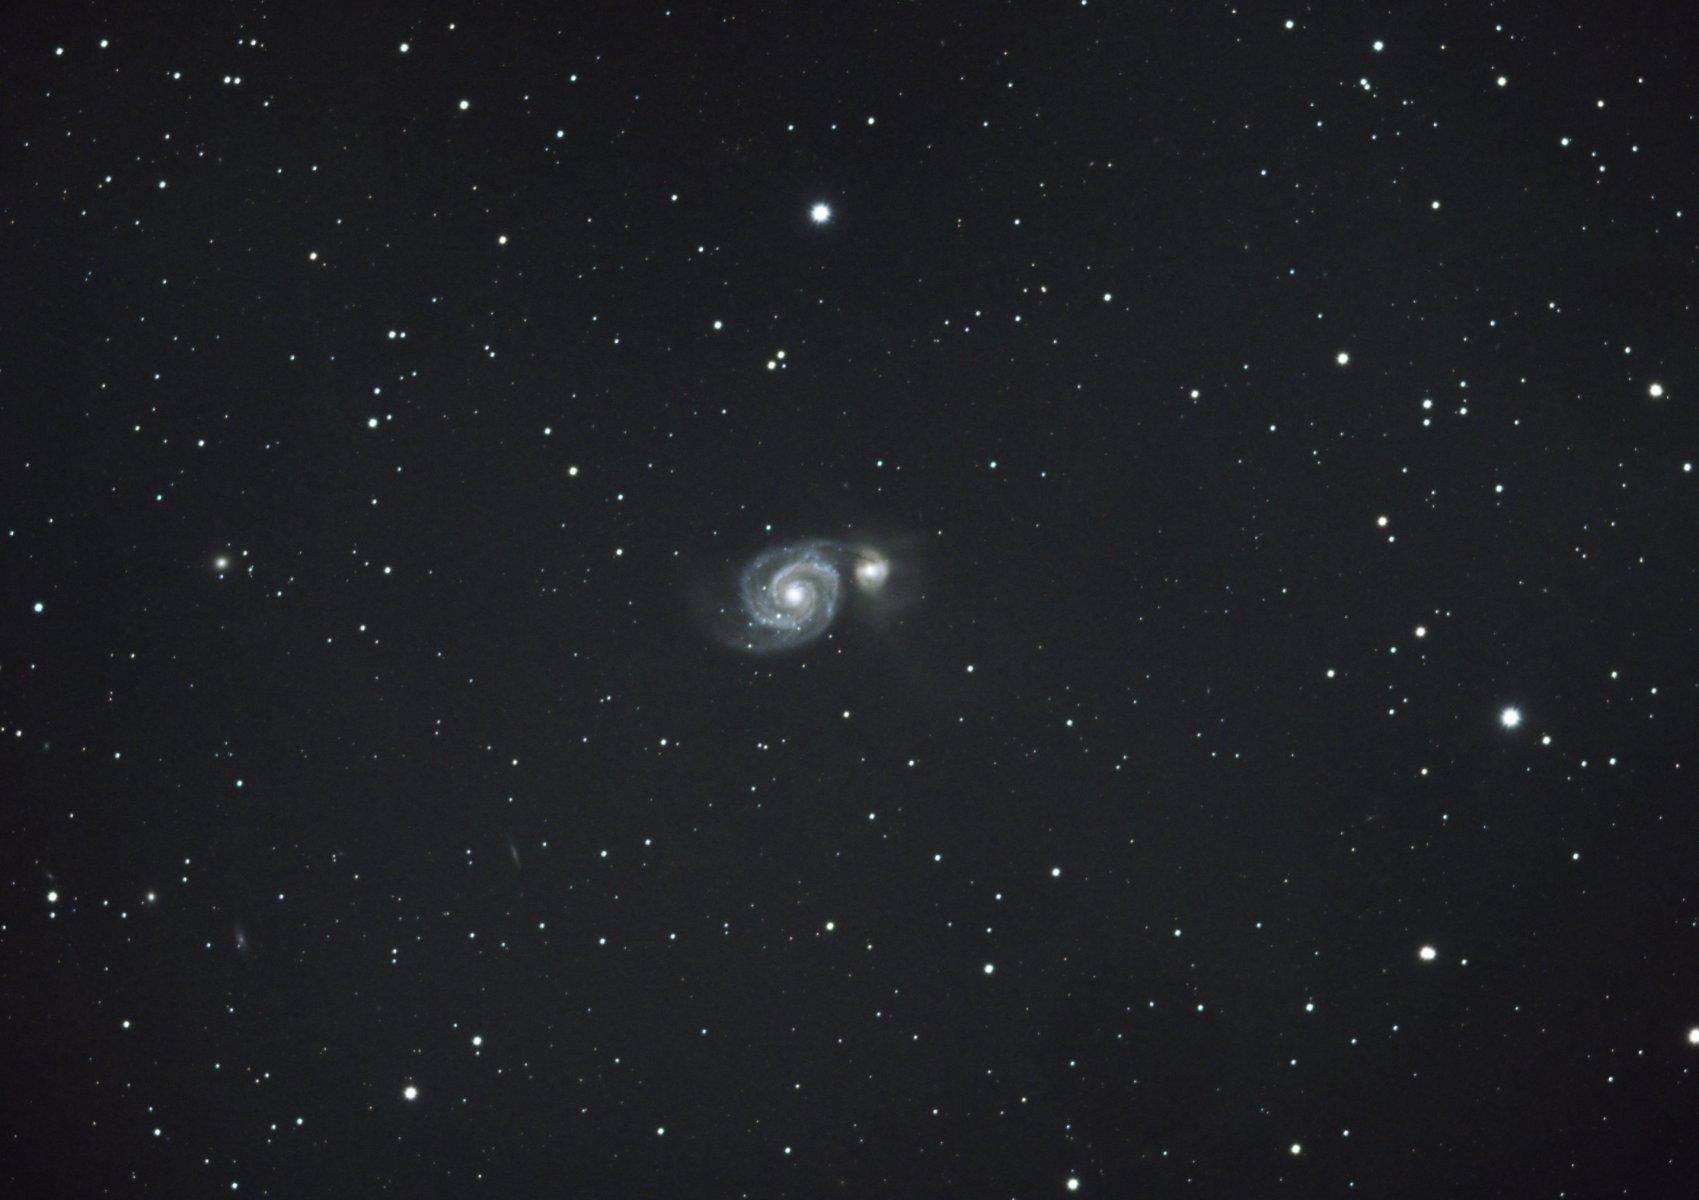 M51_WhirlpoolGalaxy_27thMarch2020.jpg